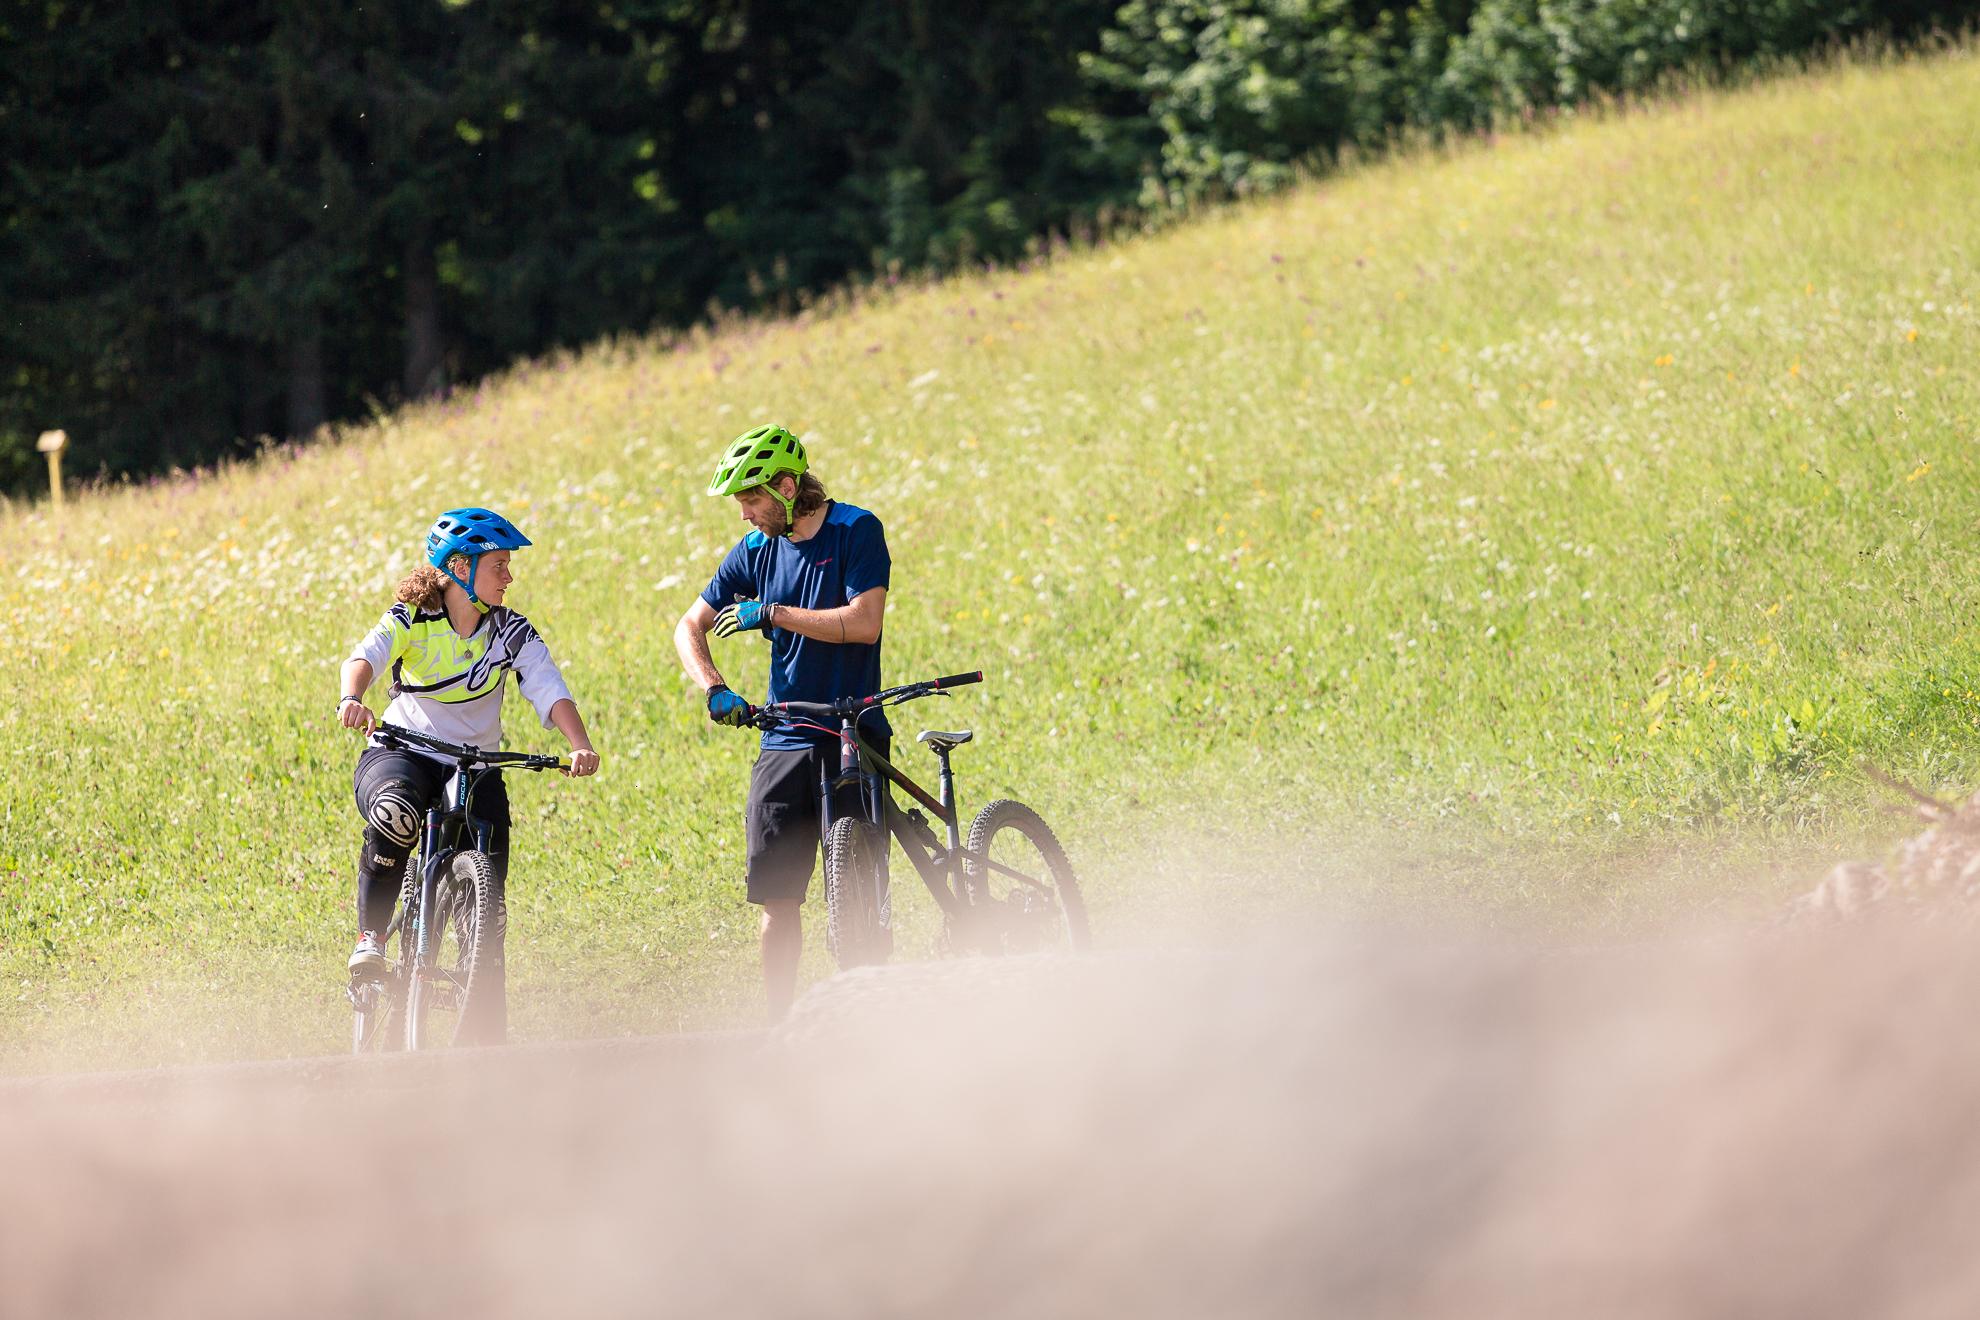 AB_20180611_Bikepark-Oberammergau_077-65.jpg